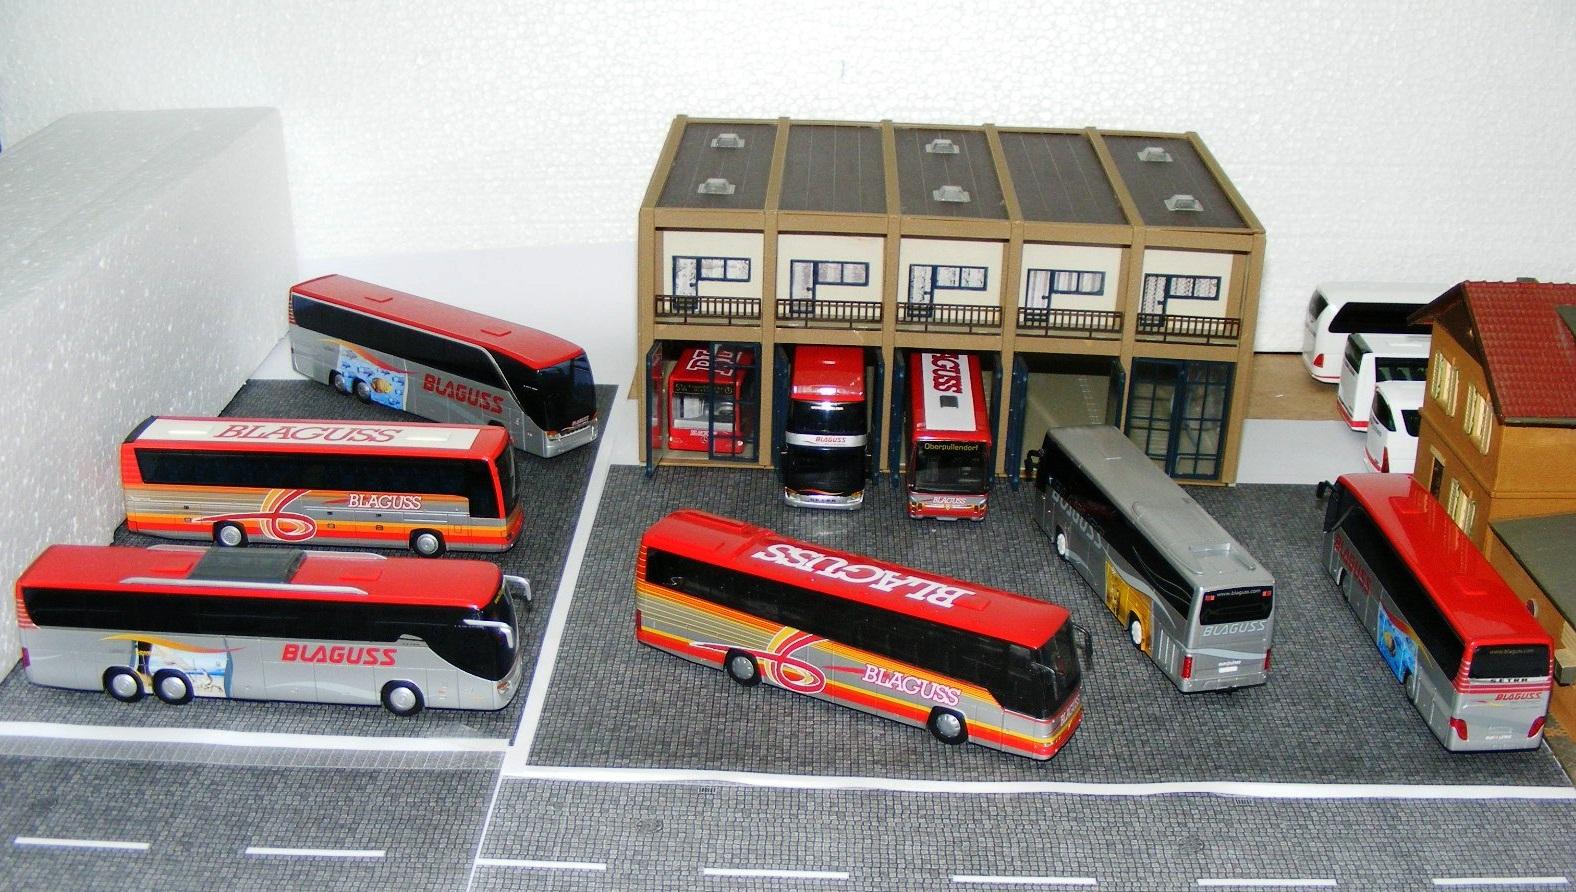 portugal buses design blaguss   colec o miniaturas 1 87